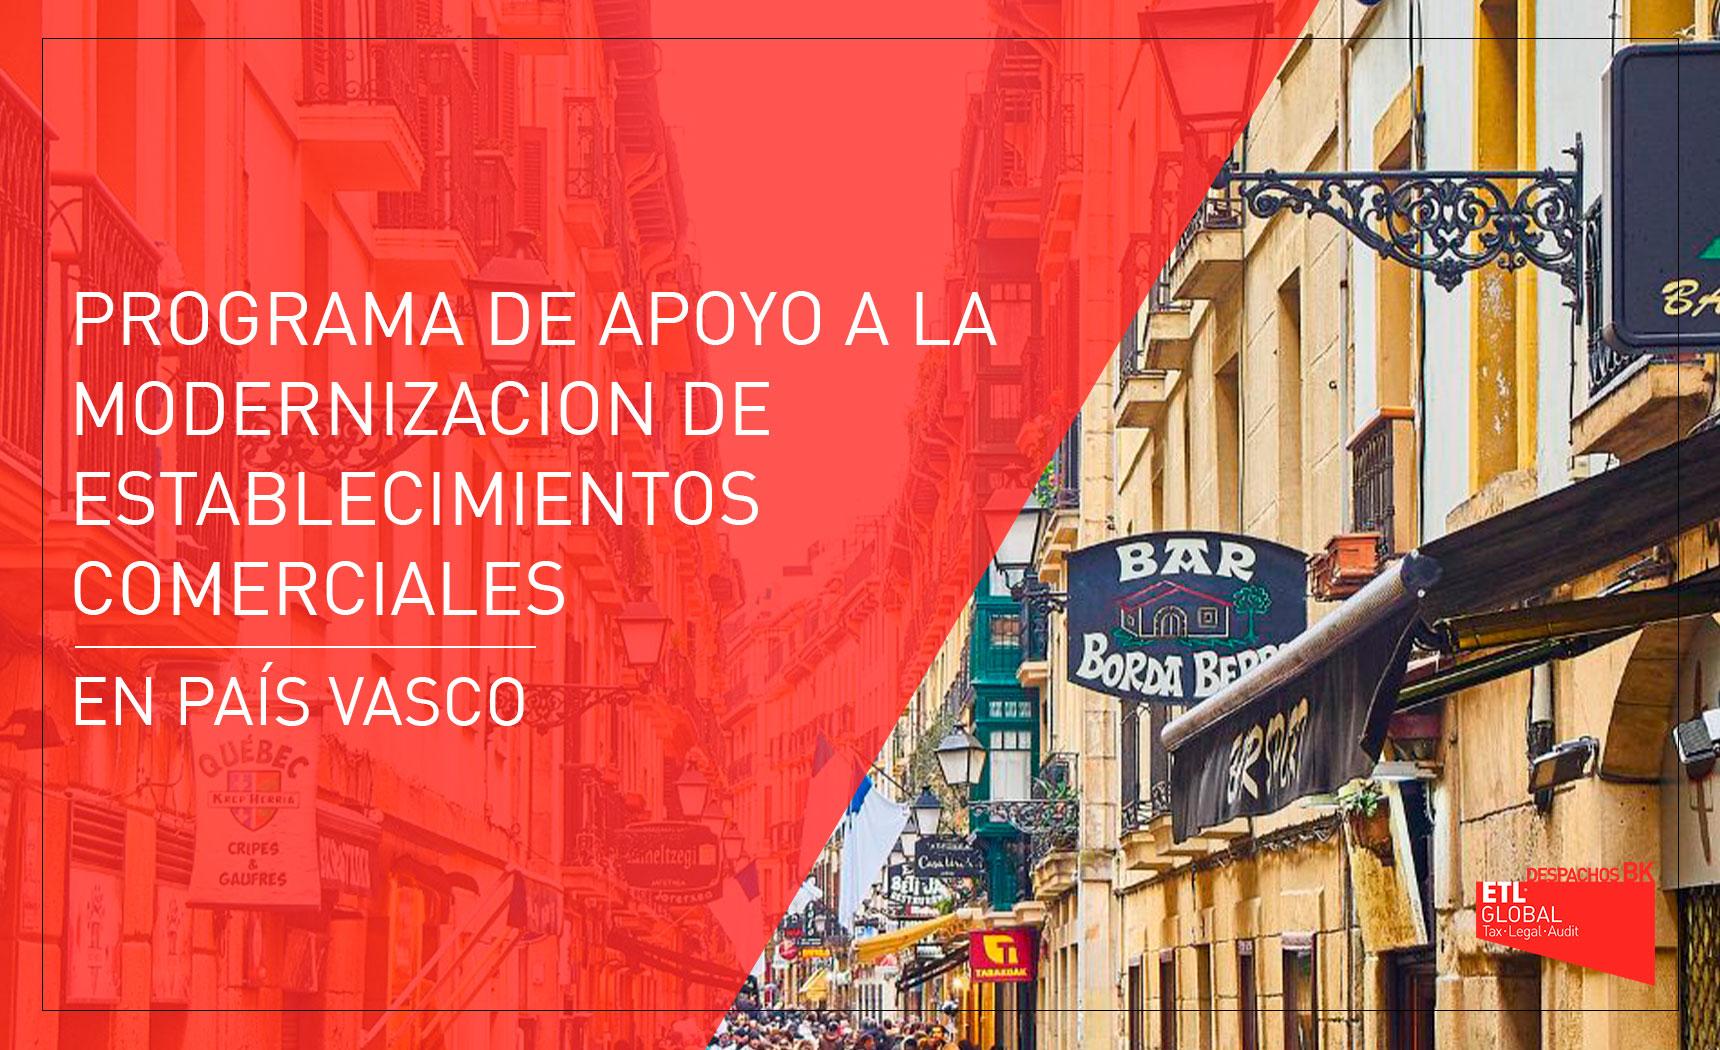 modernizacion-establecimientos comerciales pais vasco